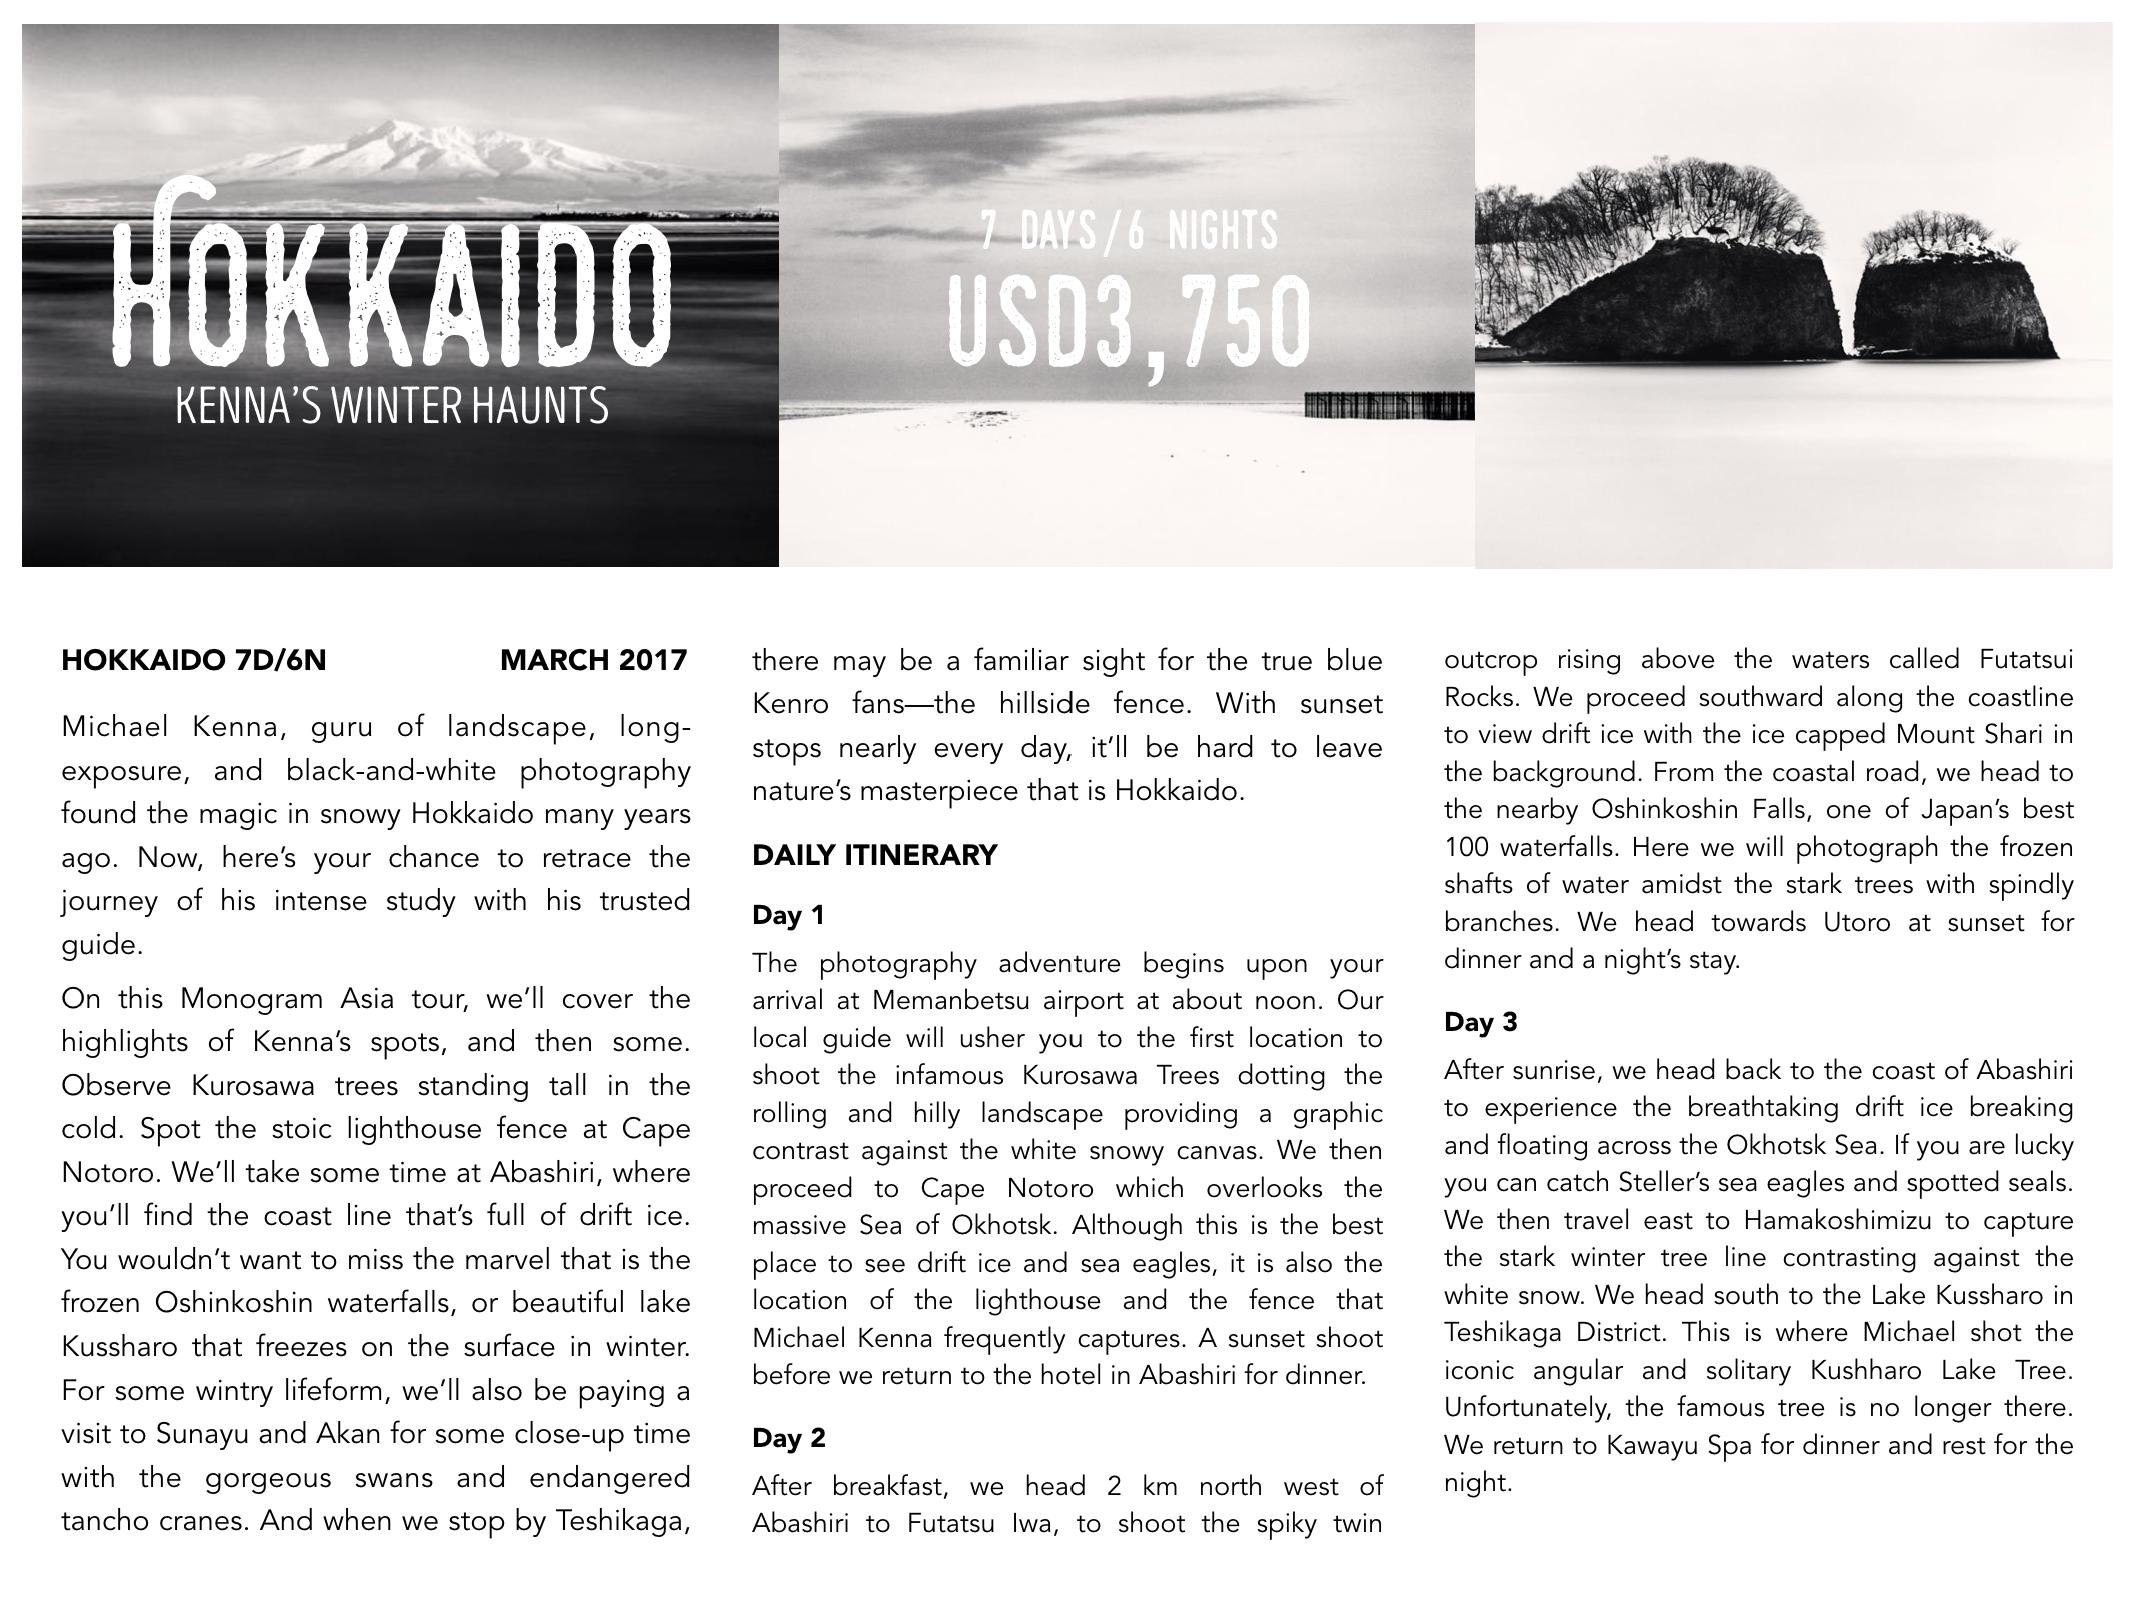 Hokkaido1.png